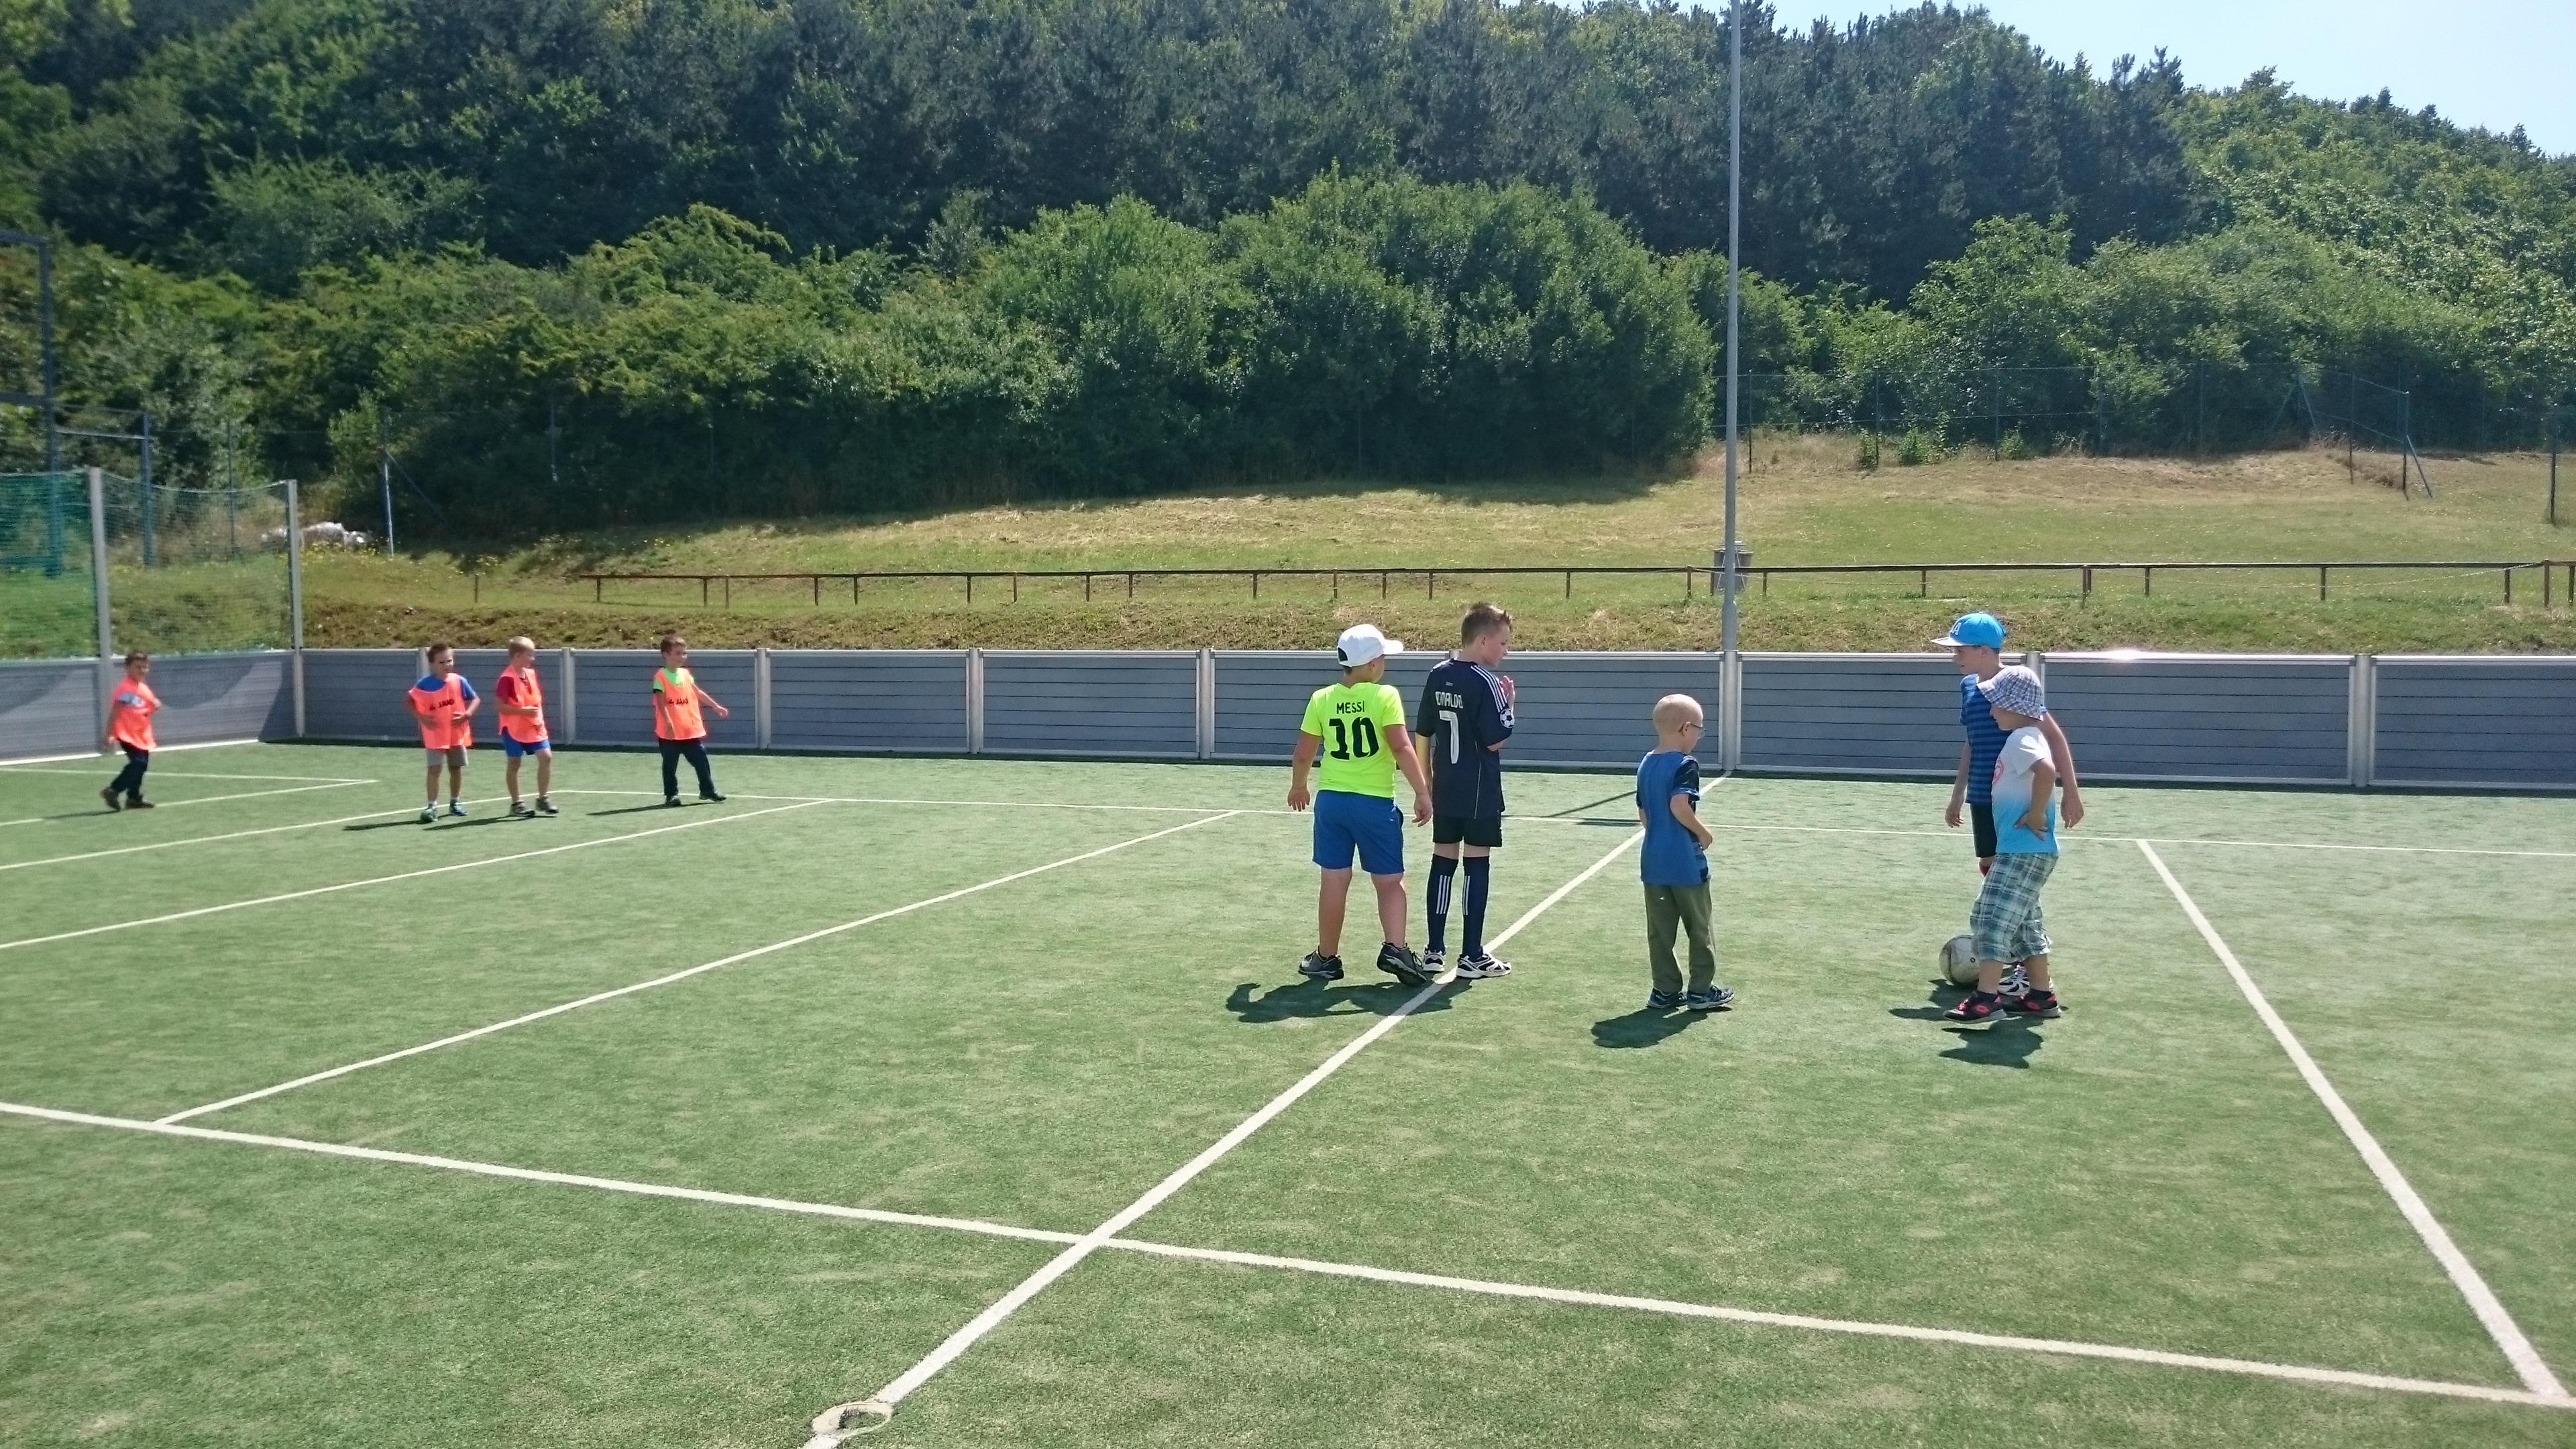 f85d787419dd8 Letný futbalový tábor Goool !!! 31. august 2016. DSC_0751 DSC_0753 DSC_0755